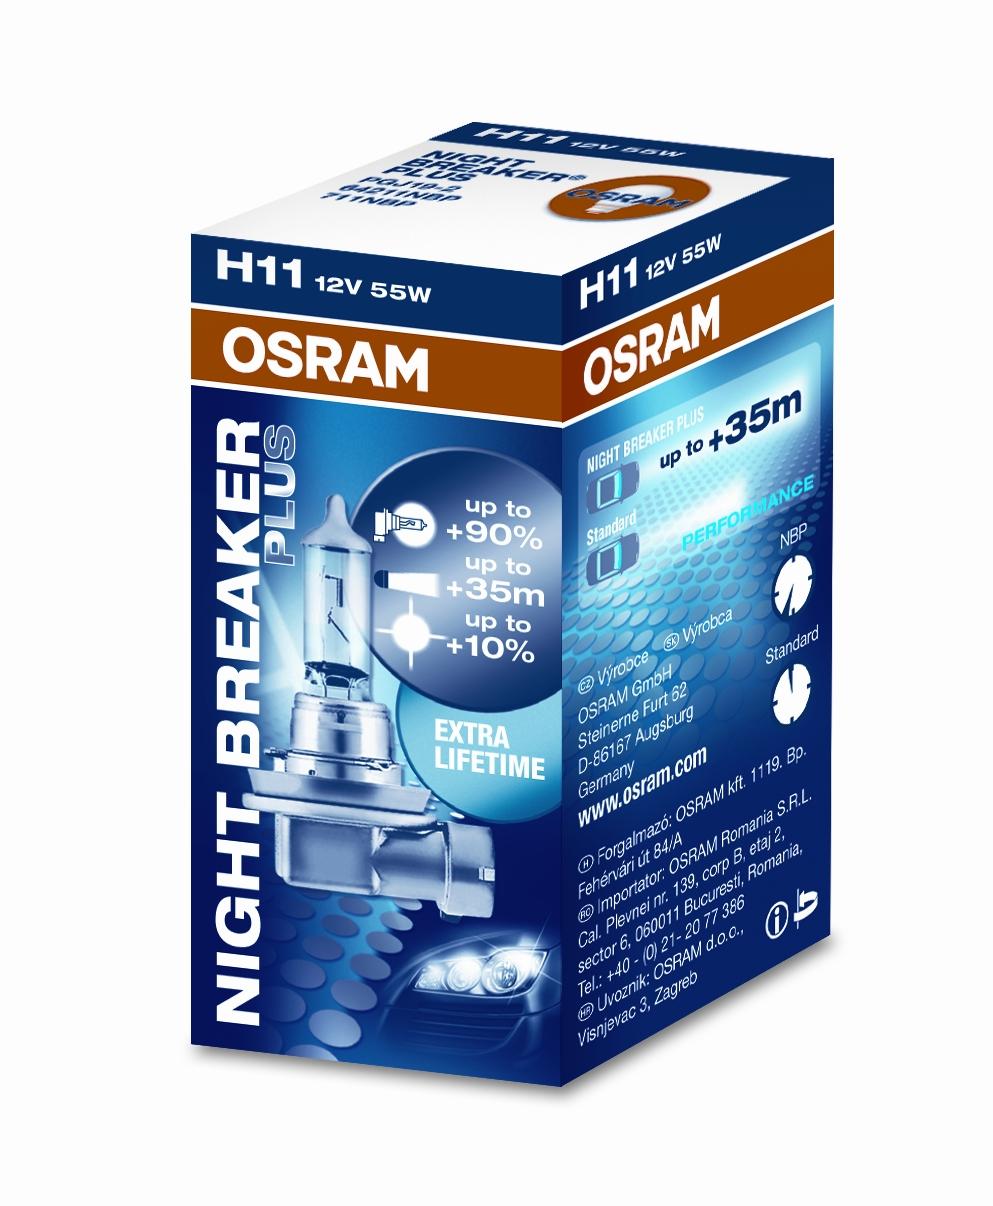 osram night breaker plus 12v up to 90 more light up to 10 whiter light 3600k mk led. Black Bedroom Furniture Sets. Home Design Ideas